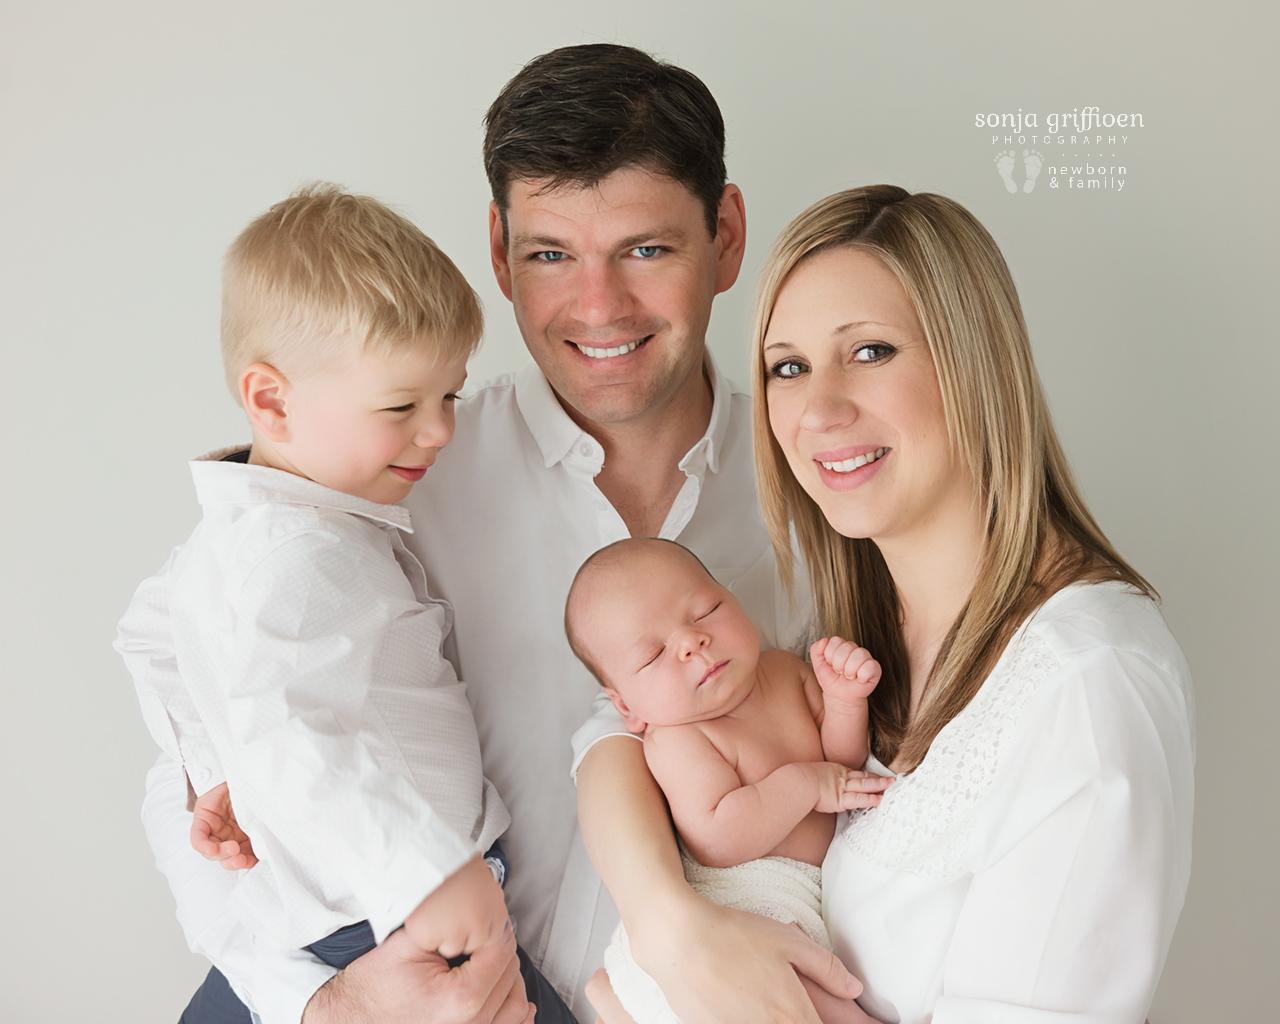 Joshua-Newborn-Brisbane-Newborn-Photographer-Sonja-Griffioen-151.jpg